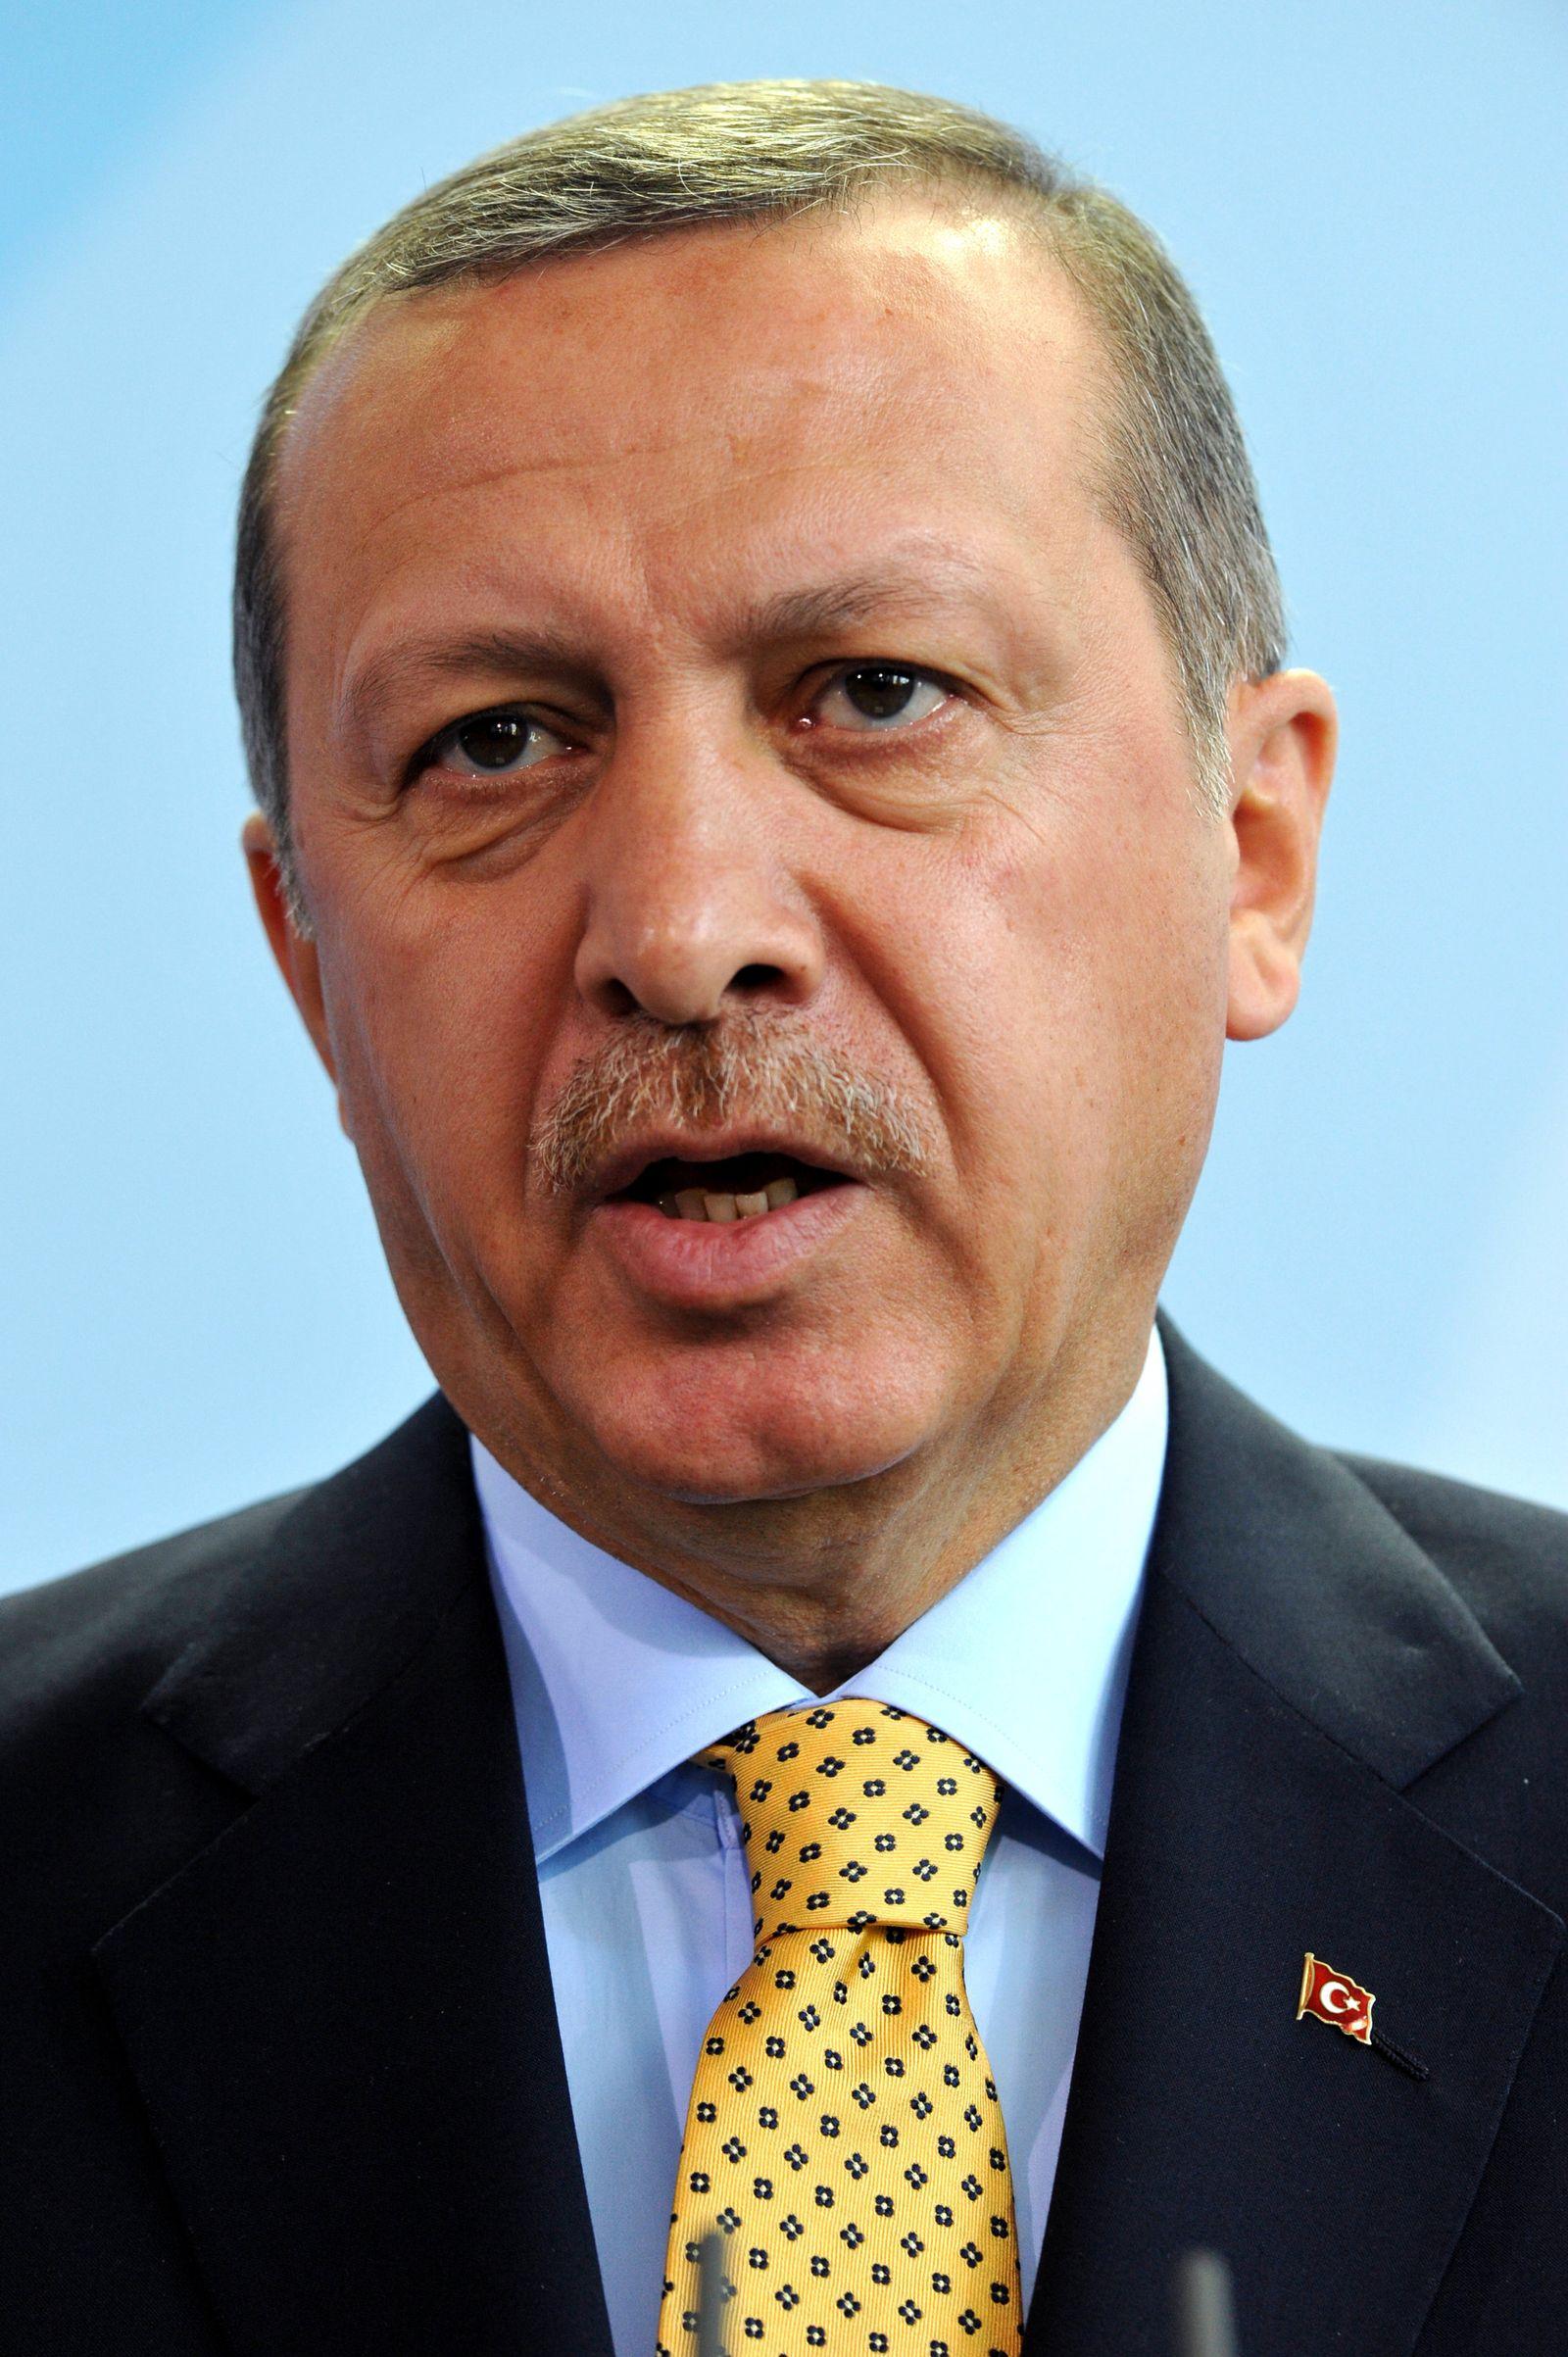 Erdogan kritisiert Merkels Türkei-Politik